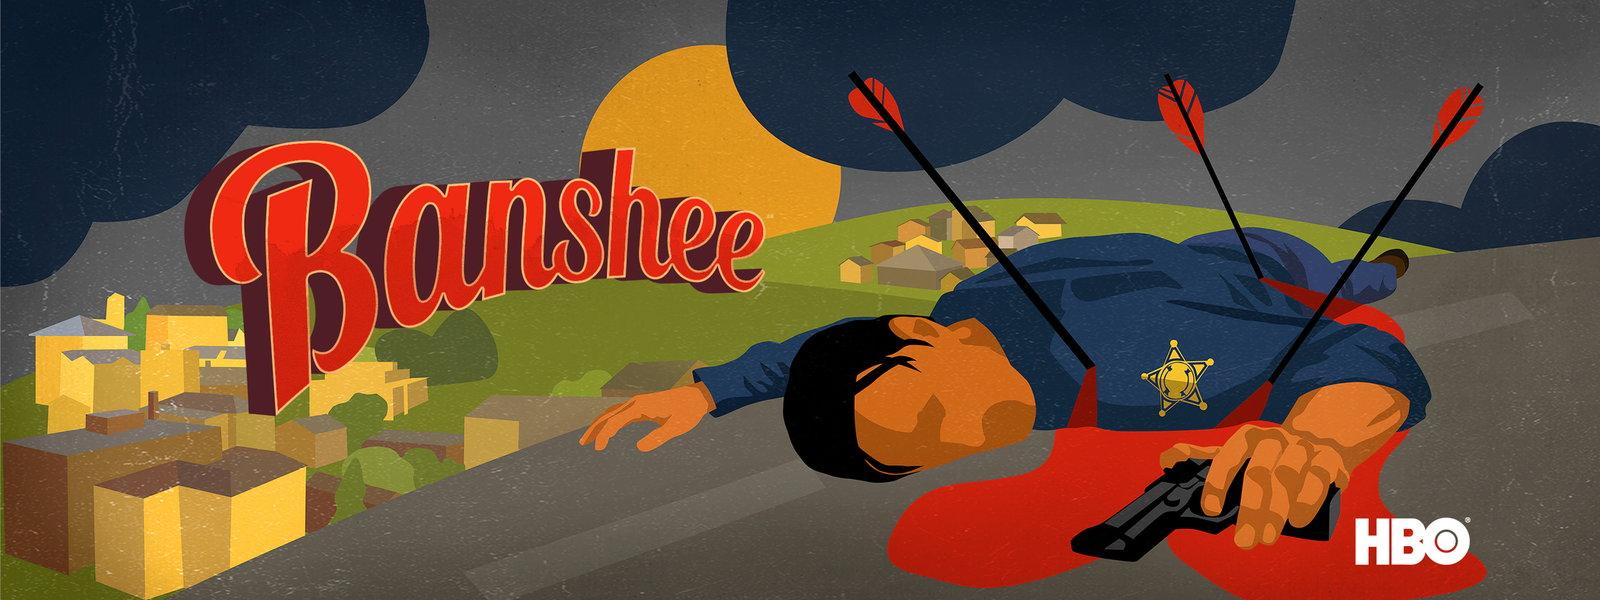 Banshee/バンシー シーズン4 動画